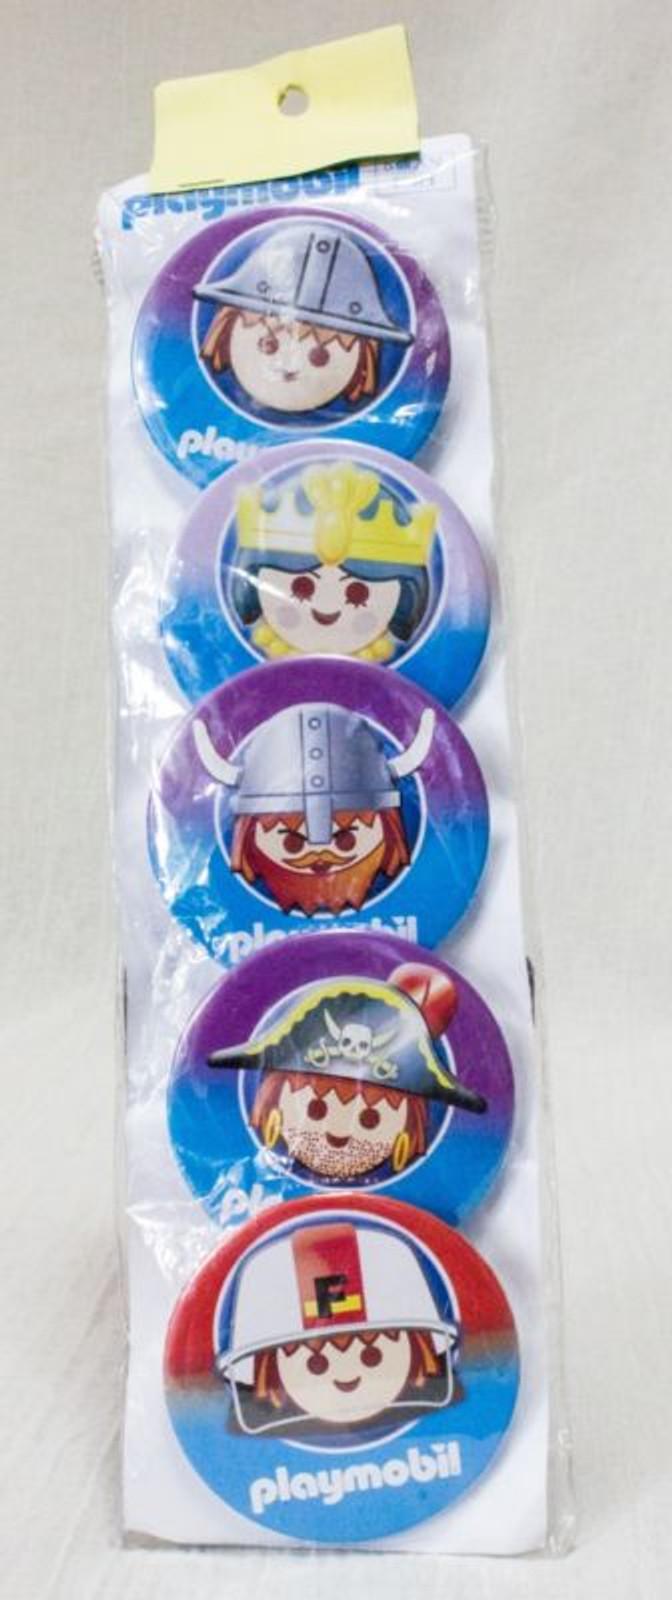 Playmobil Set of 5 Button badge